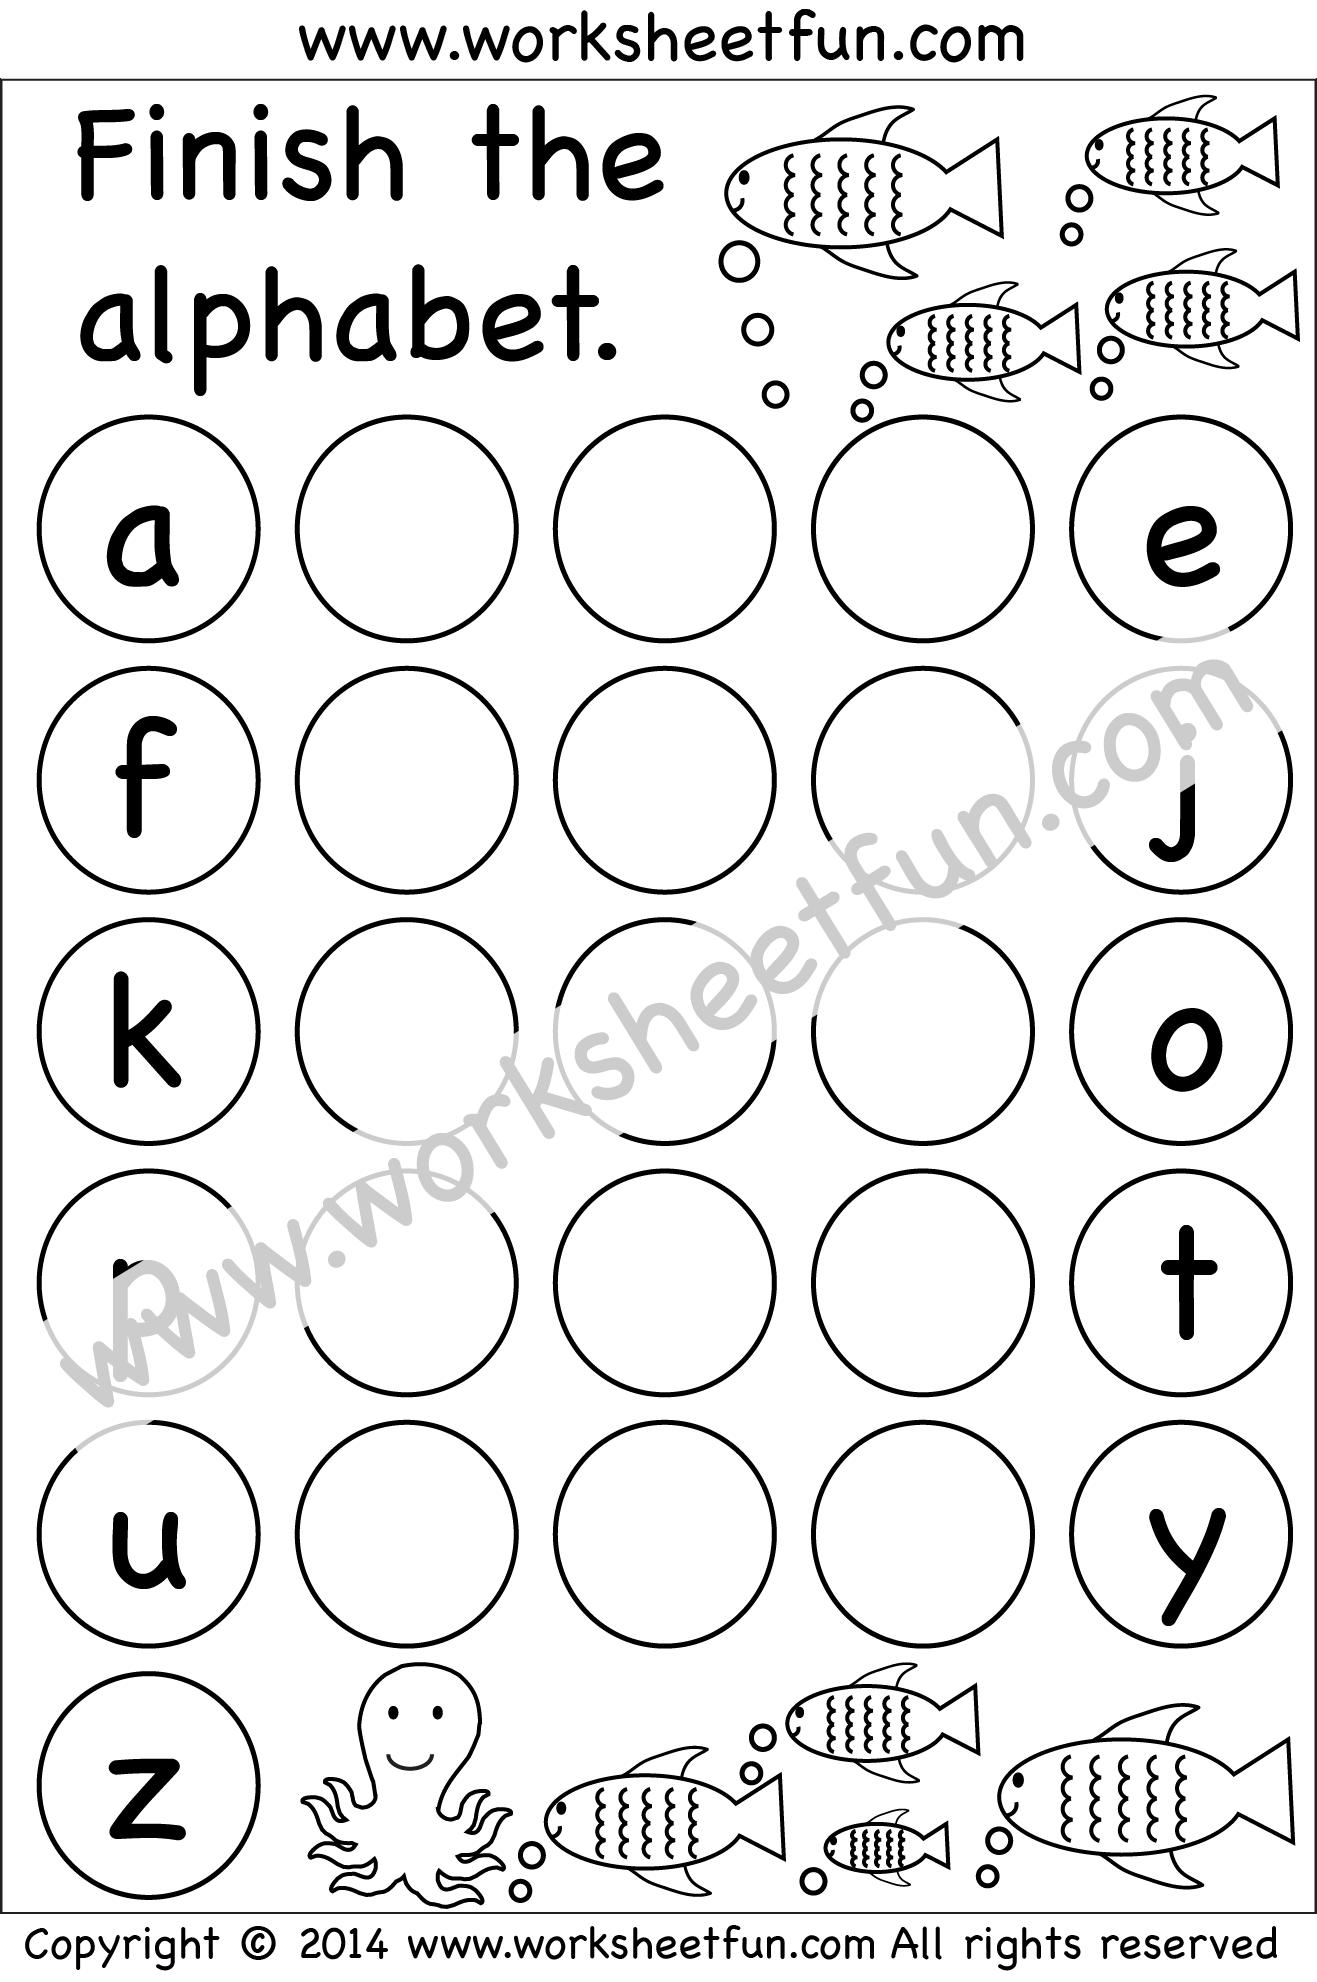 worksheet Missing Letters Worksheet missing letters alfabeto pinterest letter worksheets small lowercase worksheet free printable worksheets